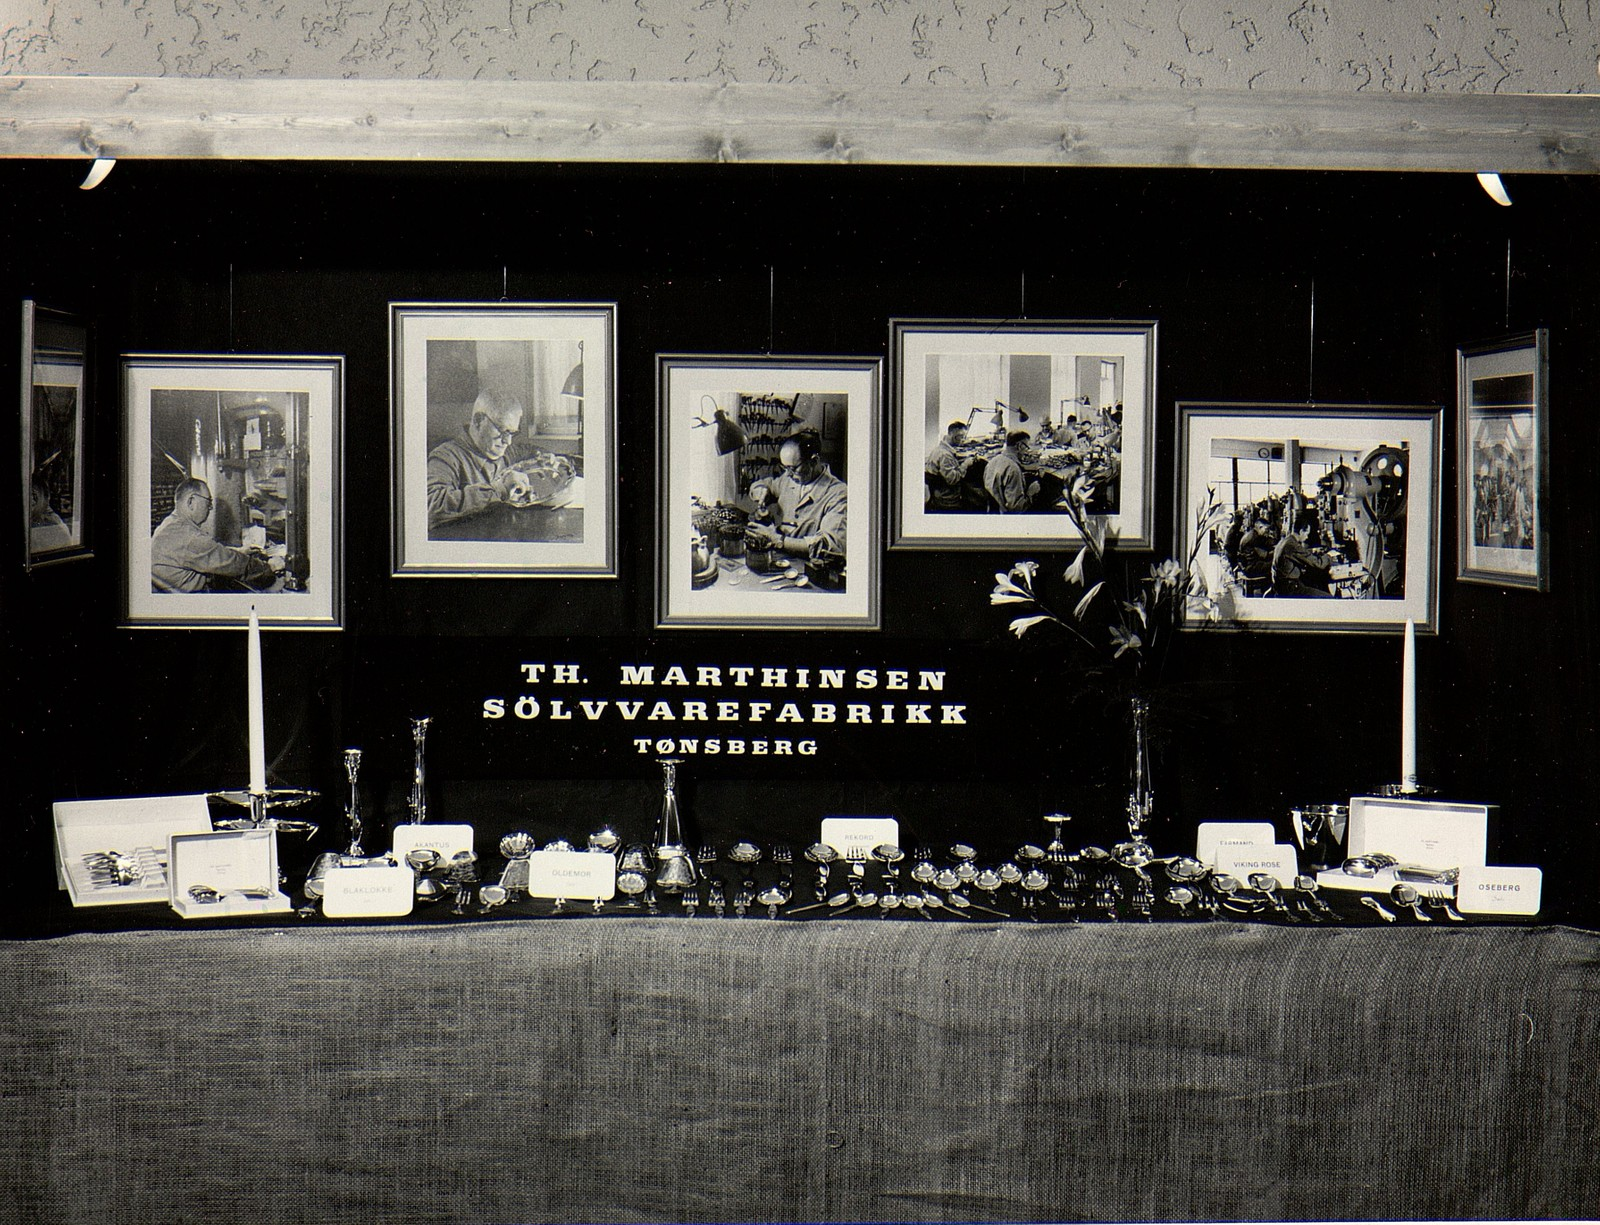 Utstilling i Haugesund 1963. Fotograf ukjent.